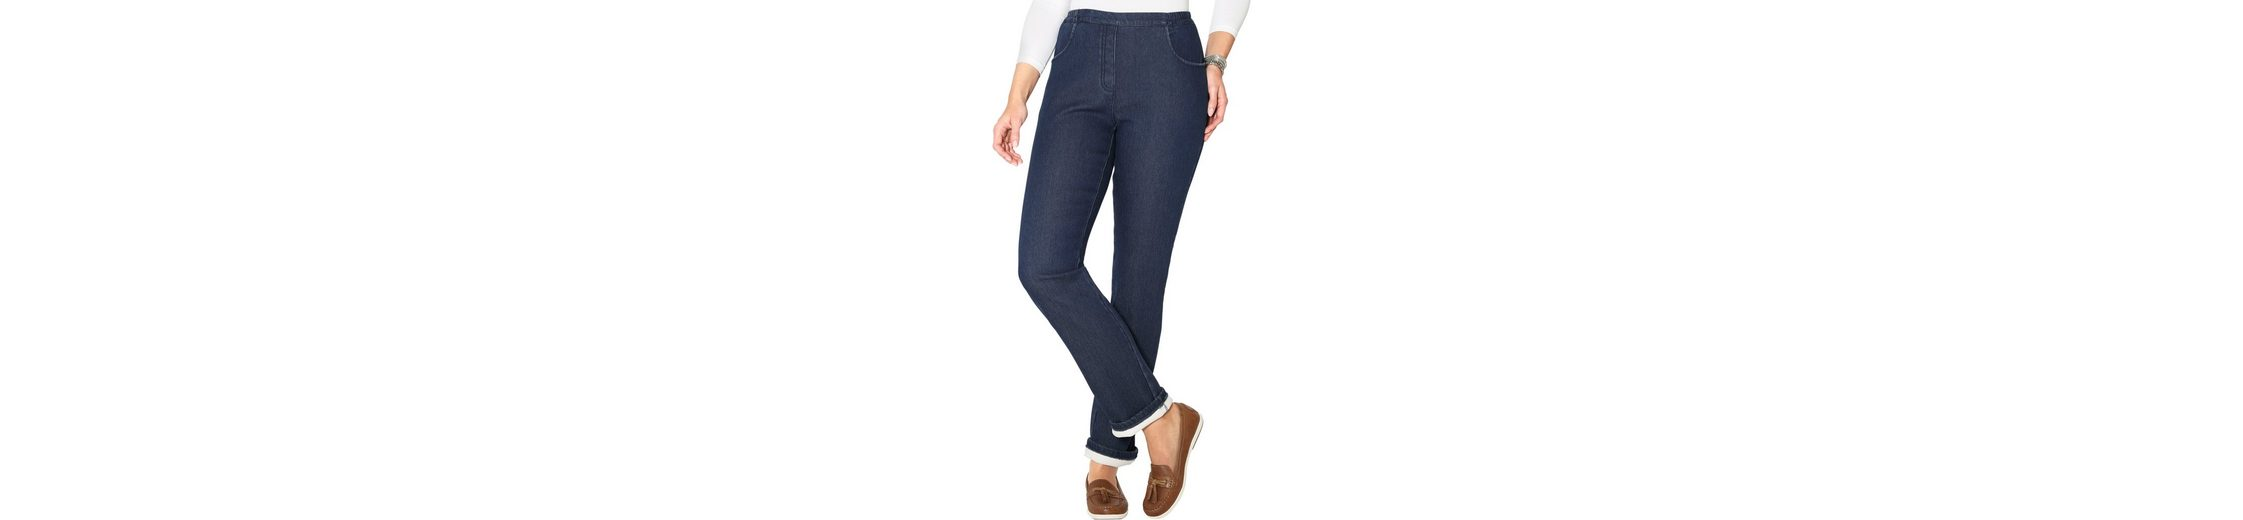 Classic Basics Thermo-Jeans - außen Denim, innen Fleece